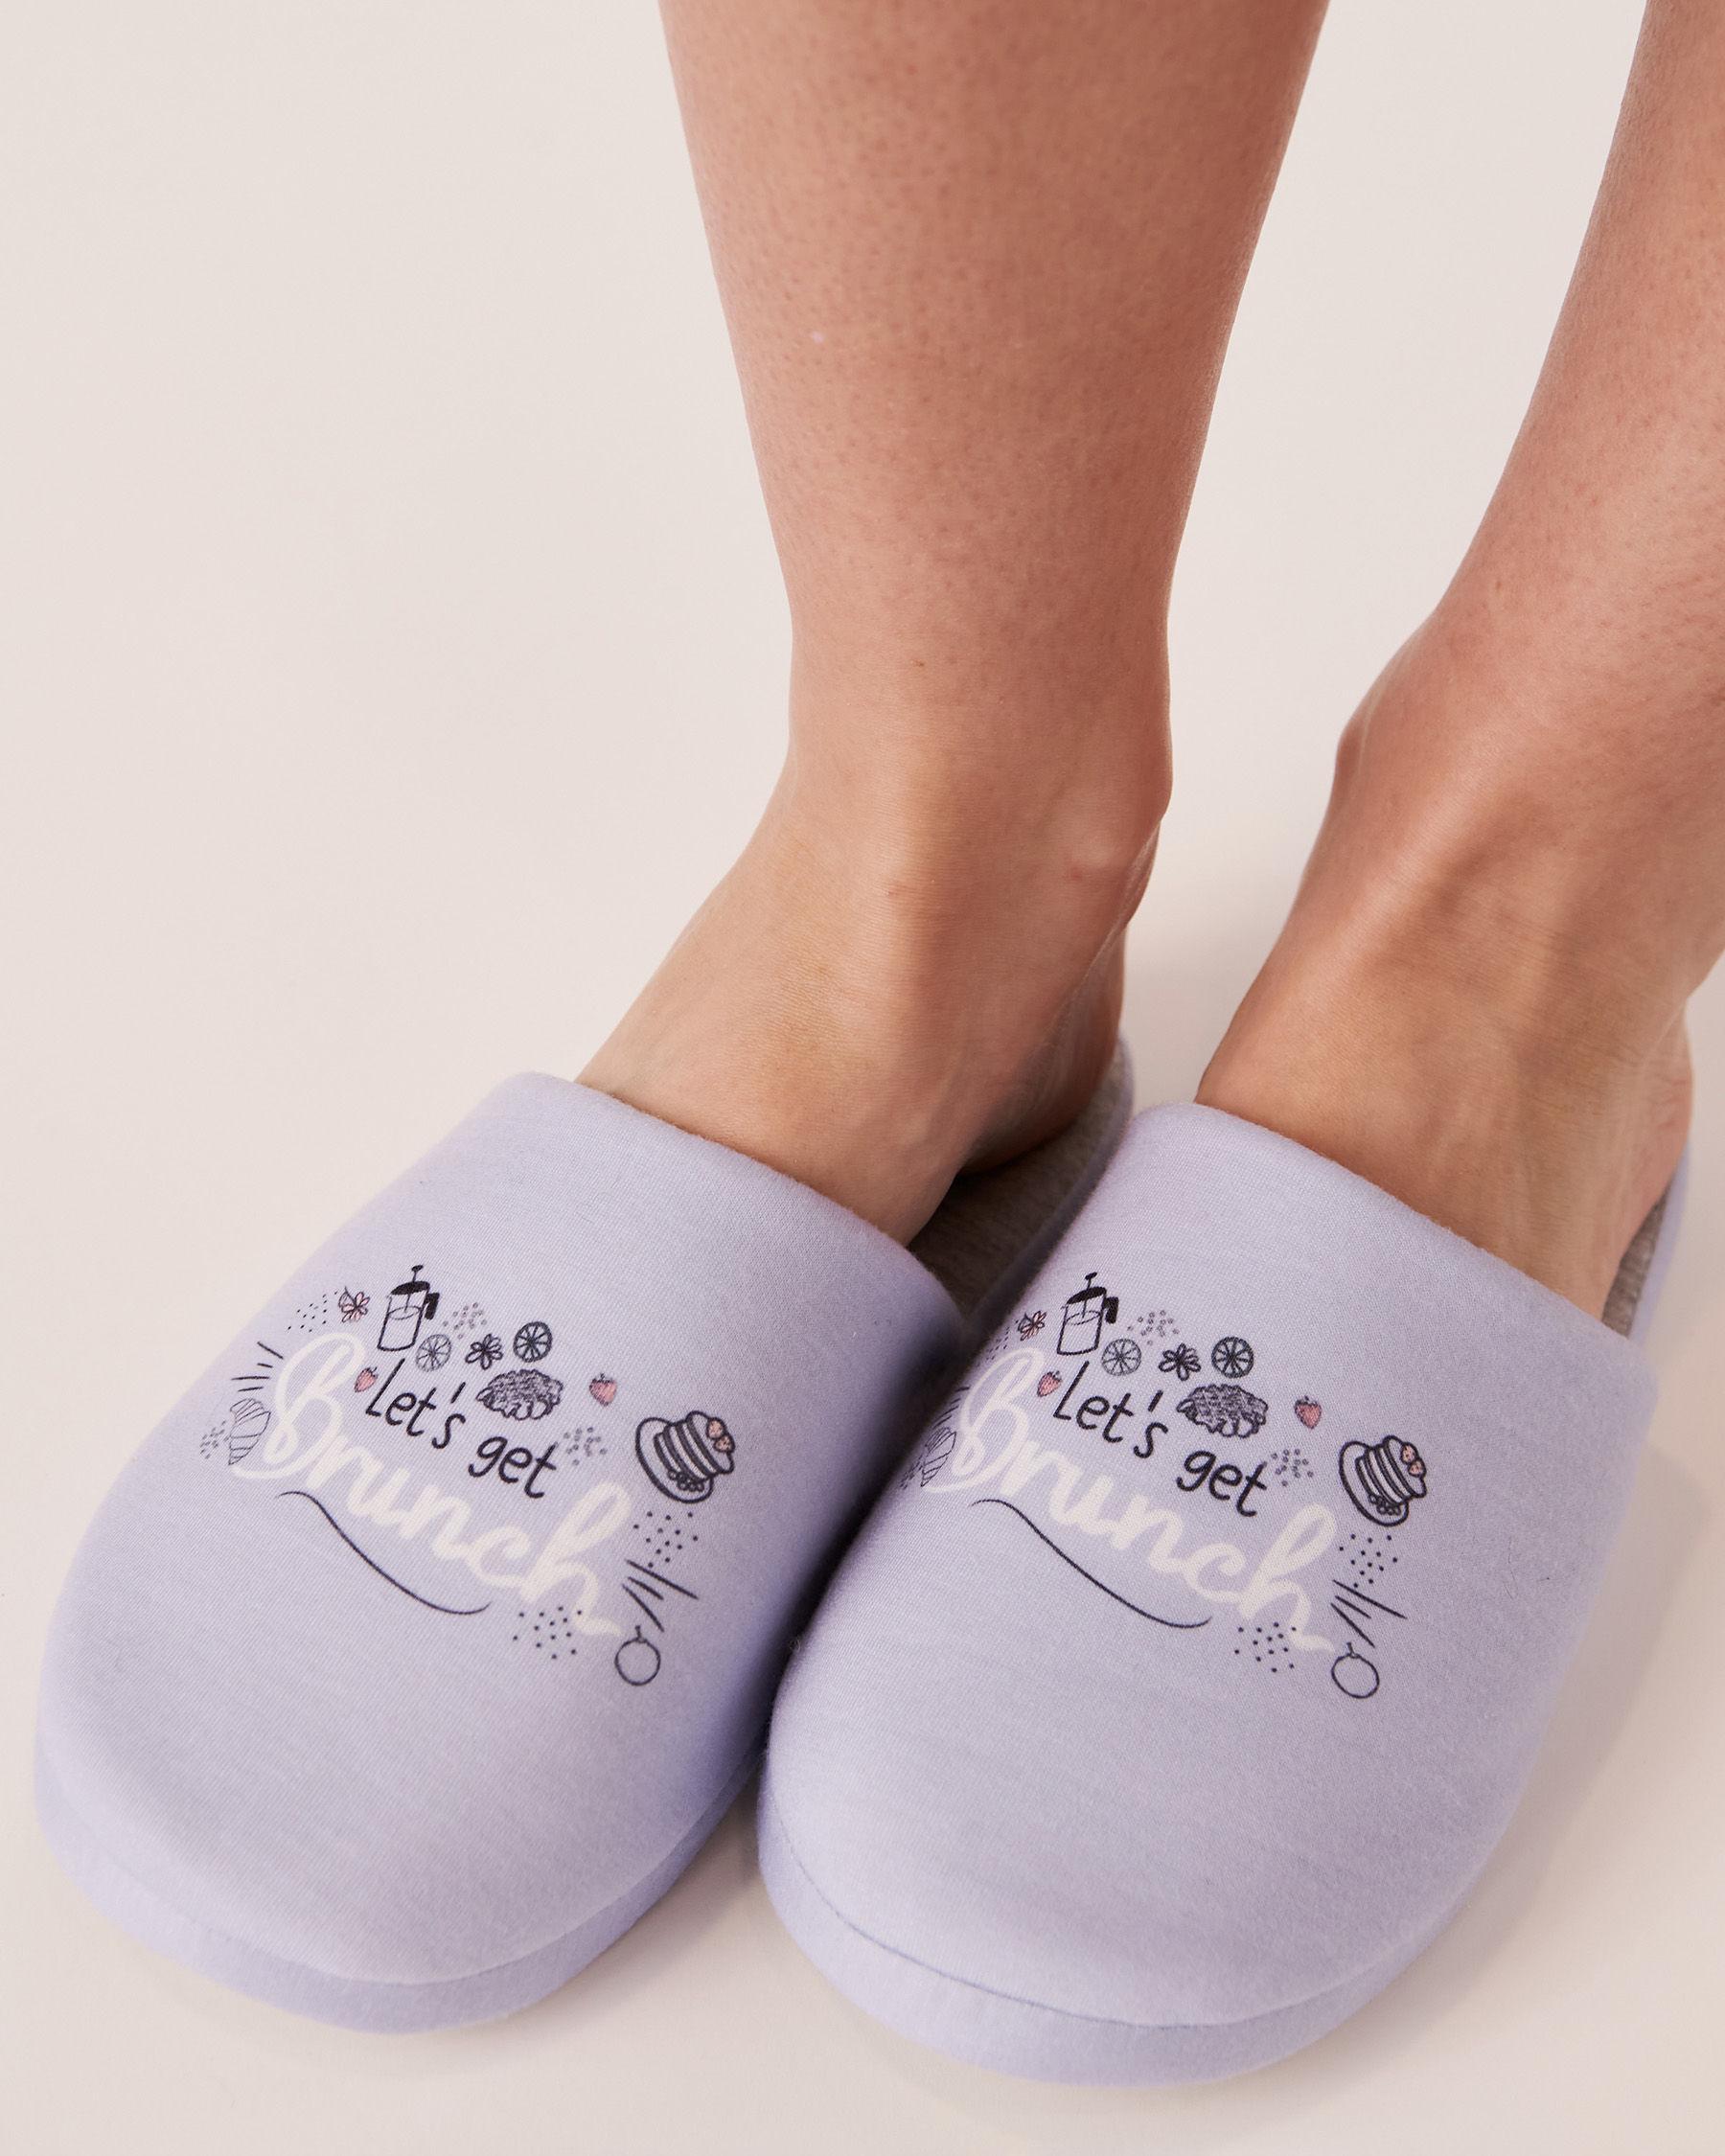 LA VIE EN ROSE Clog Slippers Blue 40700051 - View1